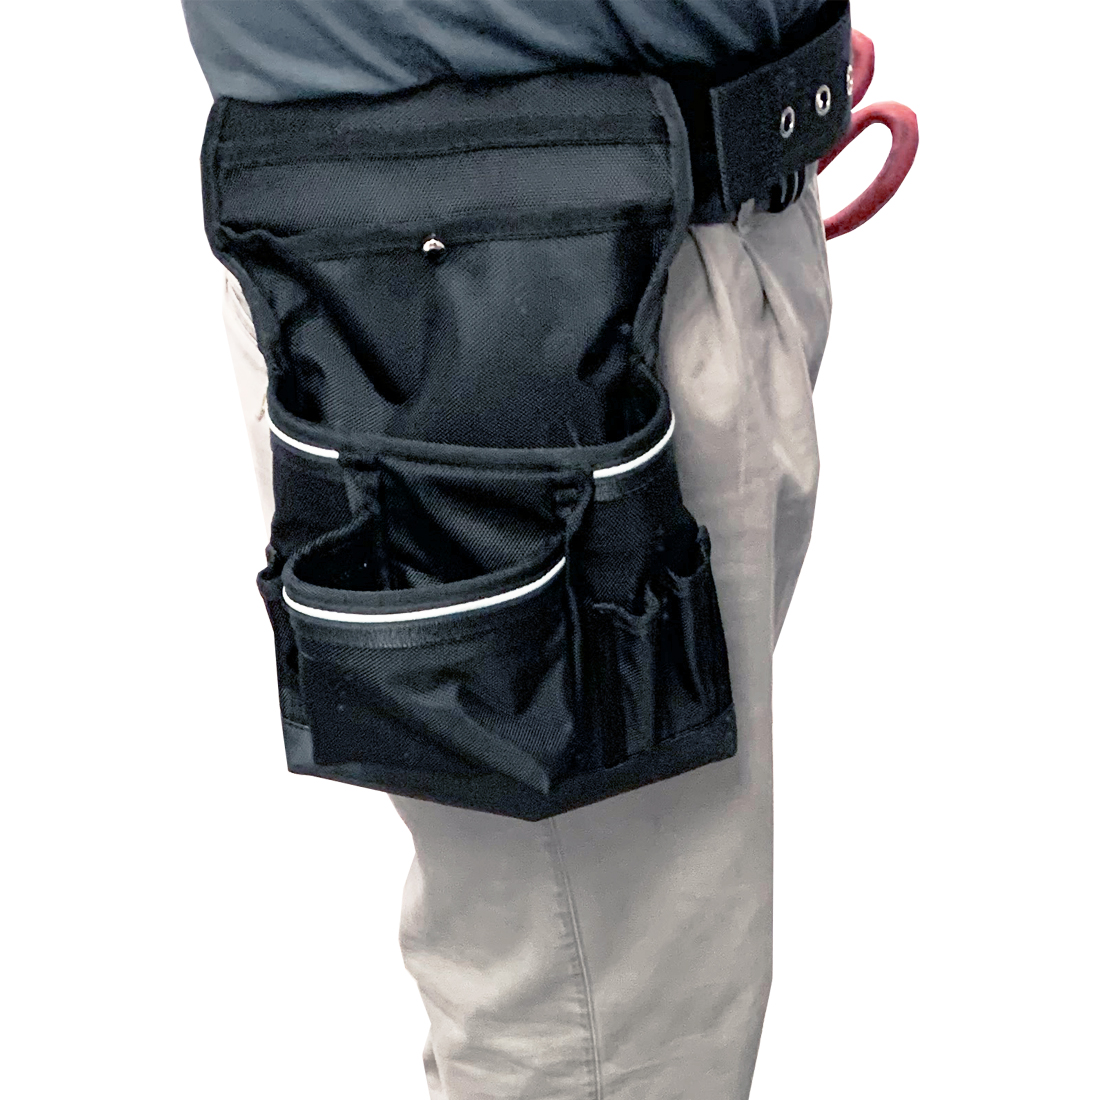 TechServ Nail Pouch Twin Bag